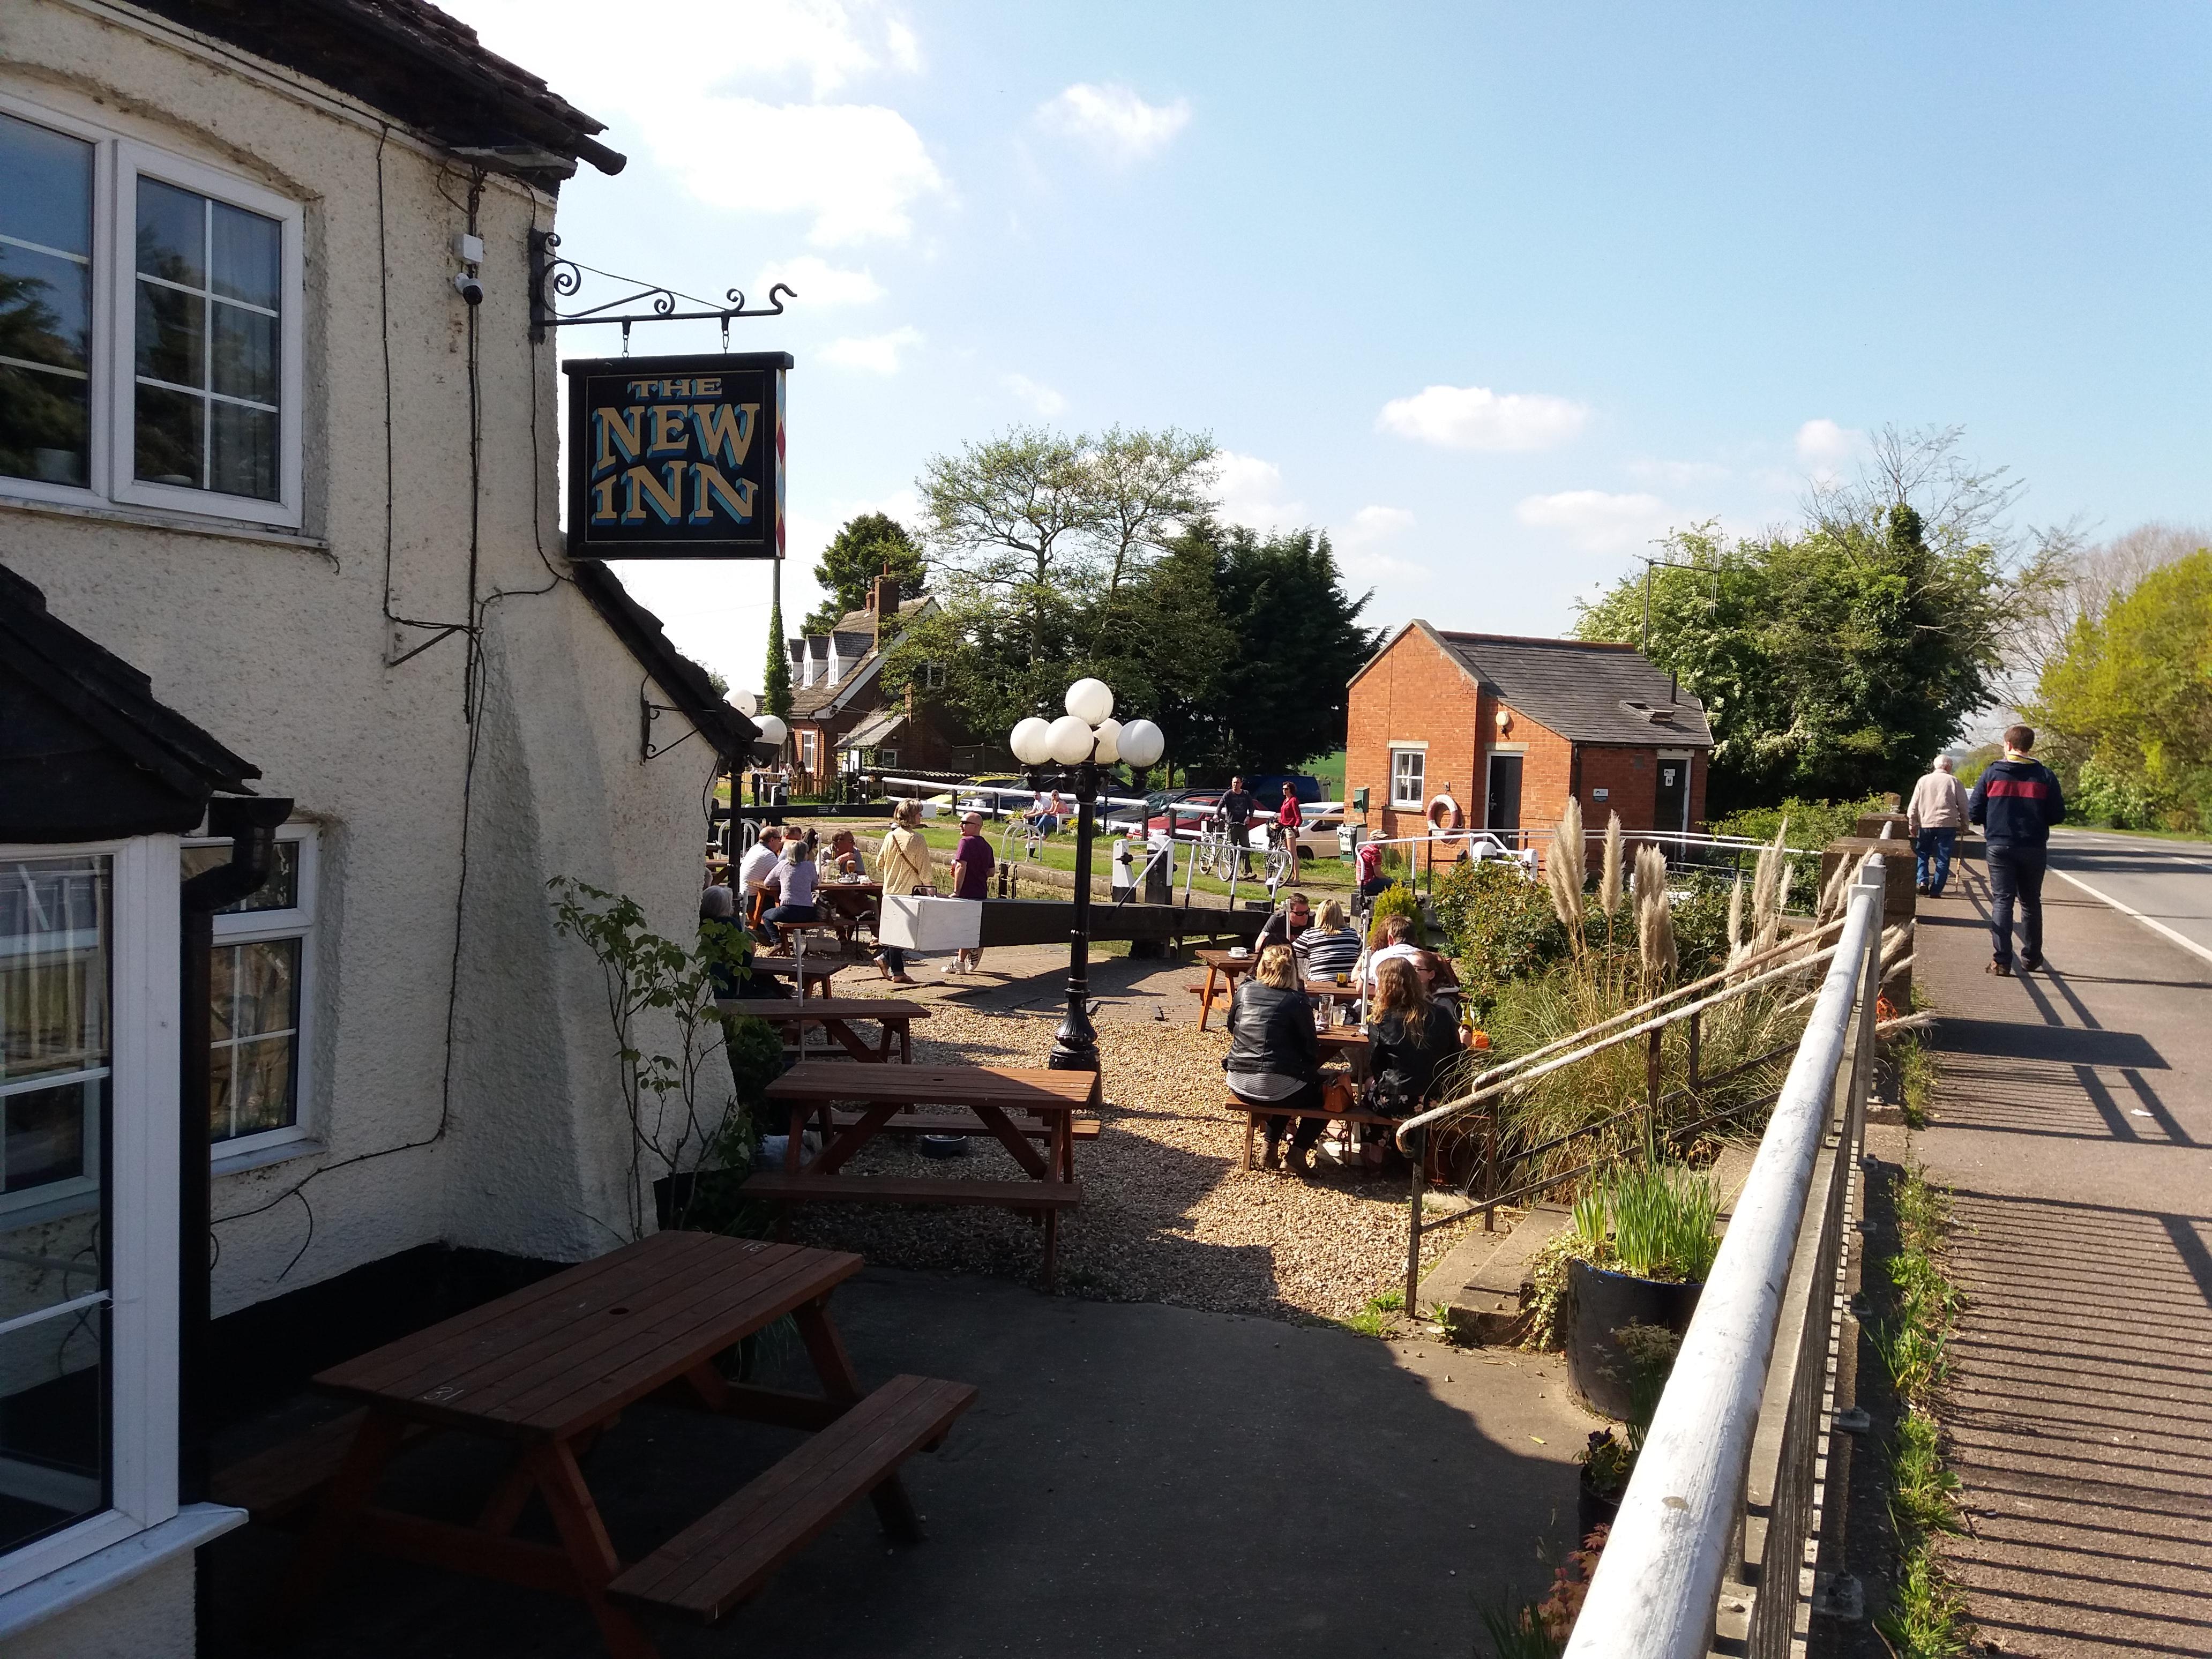 New Inn, Buckby Wharf, Northamptonshire